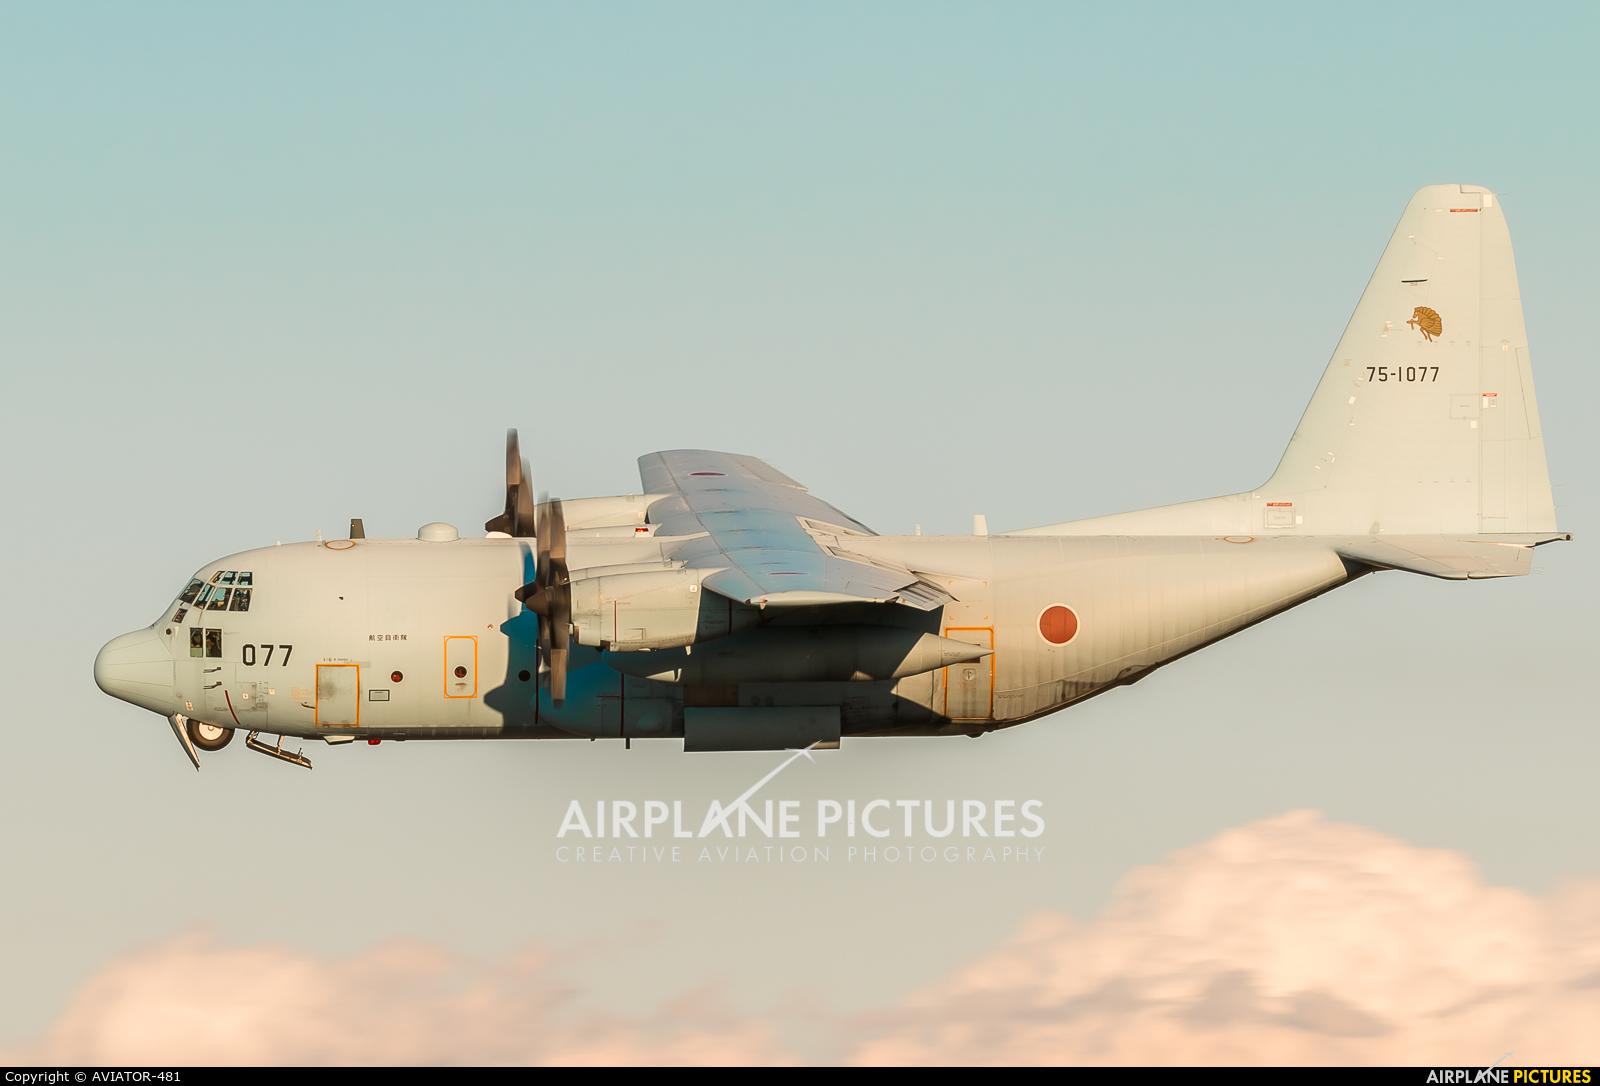 Japan - Air Self Defence Force 75-1077 aircraft at Iruma AB